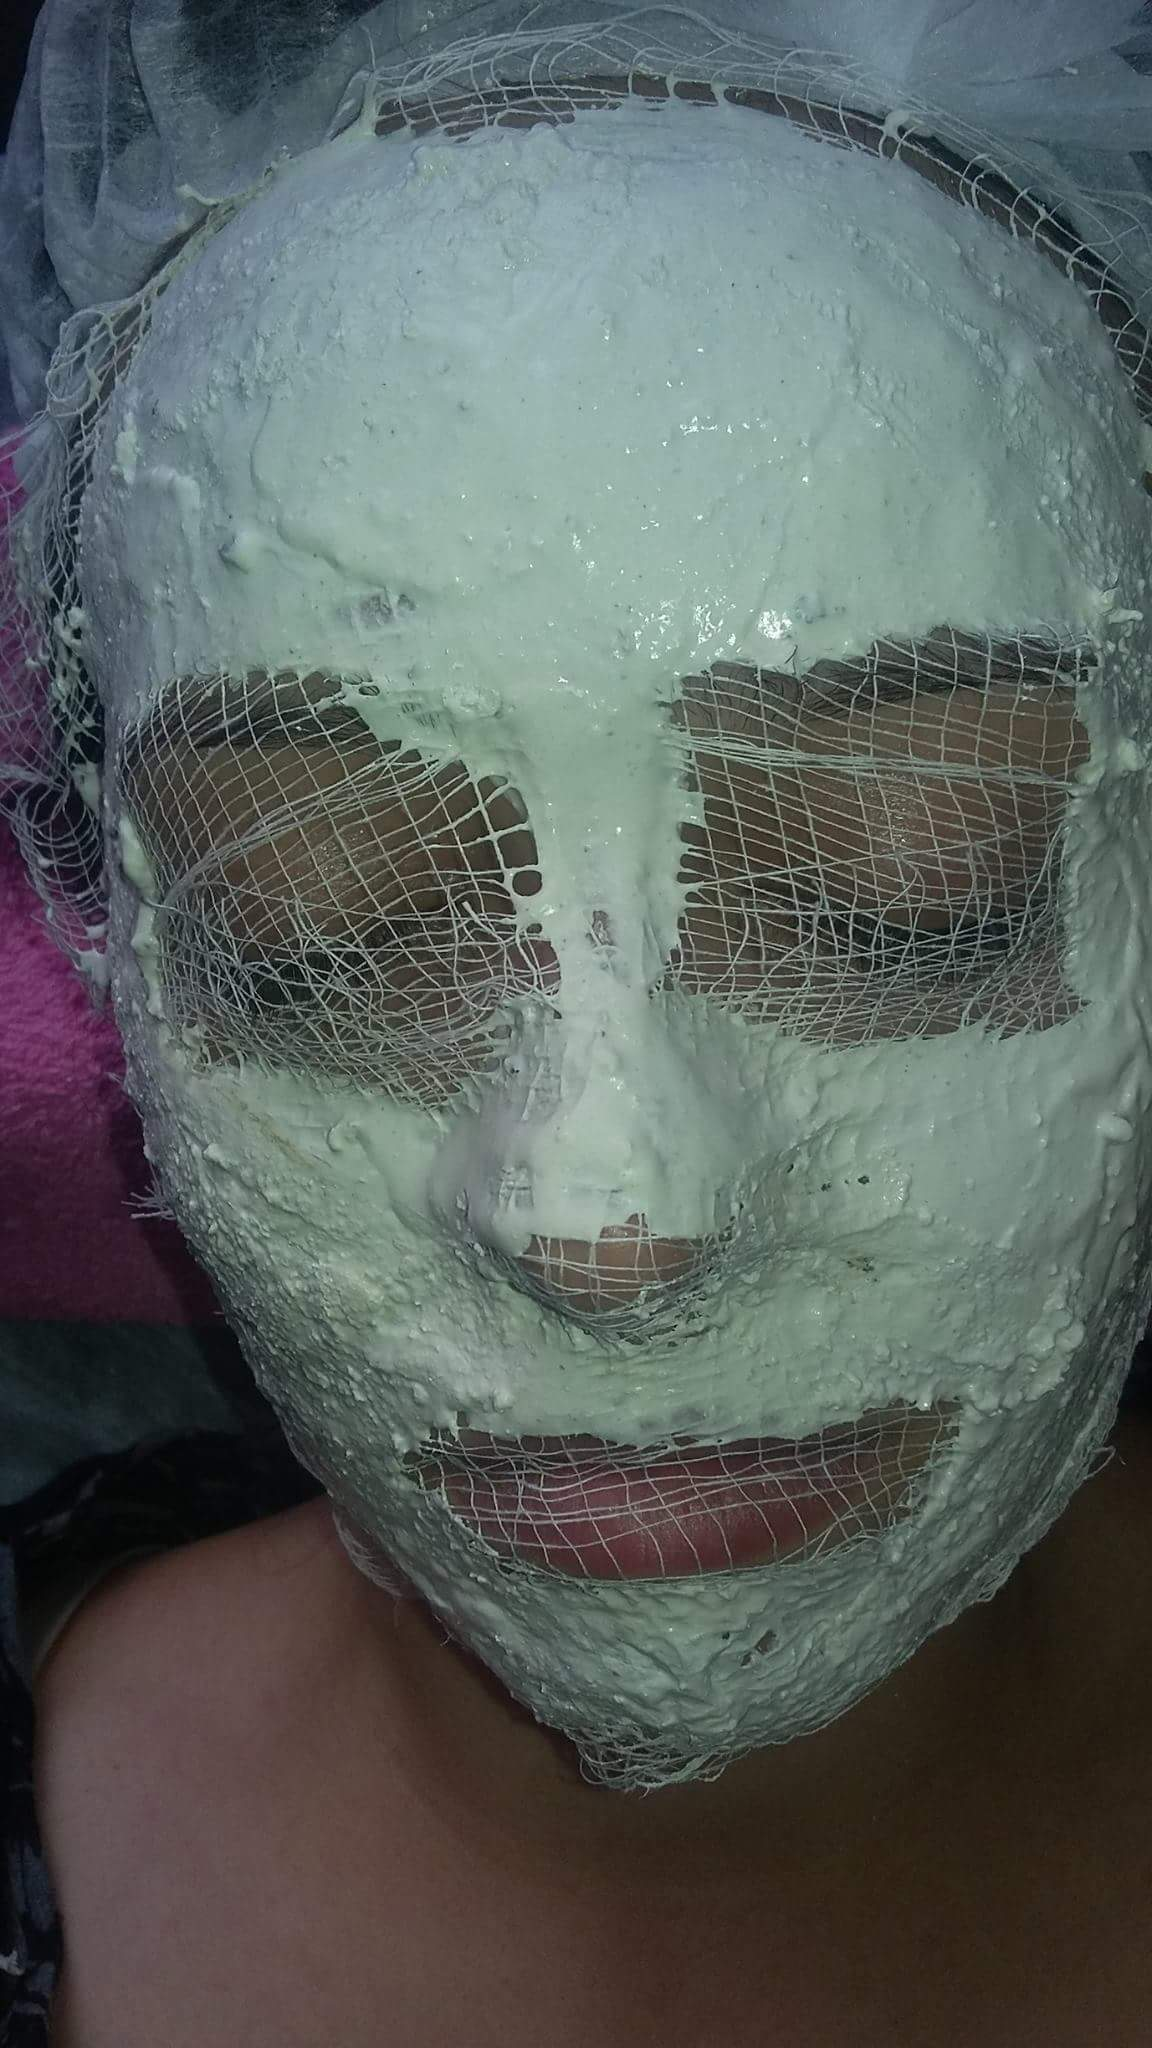 Máscara de pérola ,revigora a pele desvitalizada.  estética esteticista